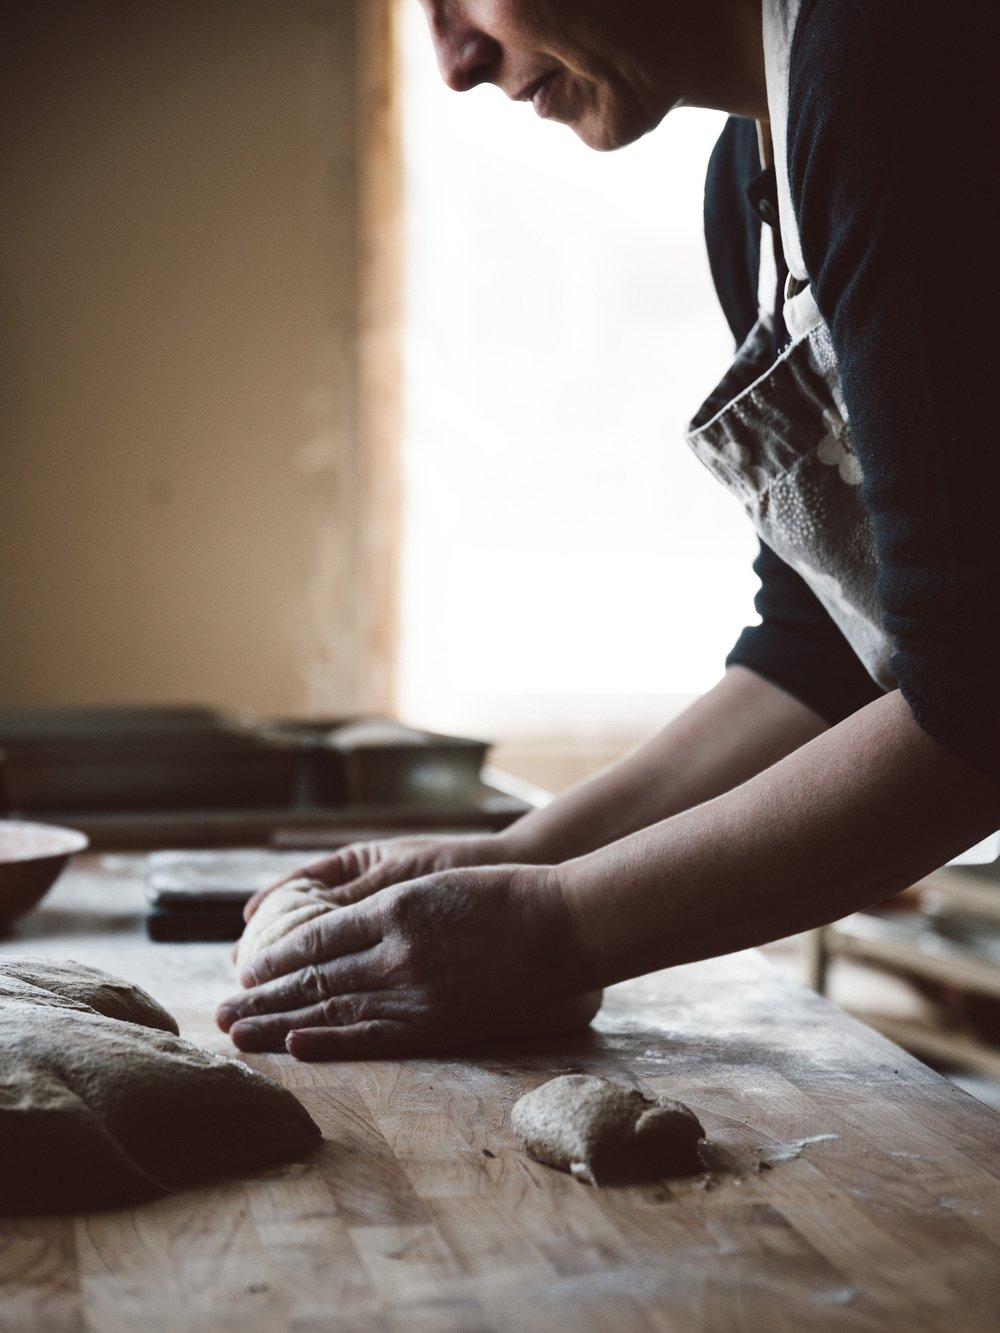 Stella_Bakery-19.jpg